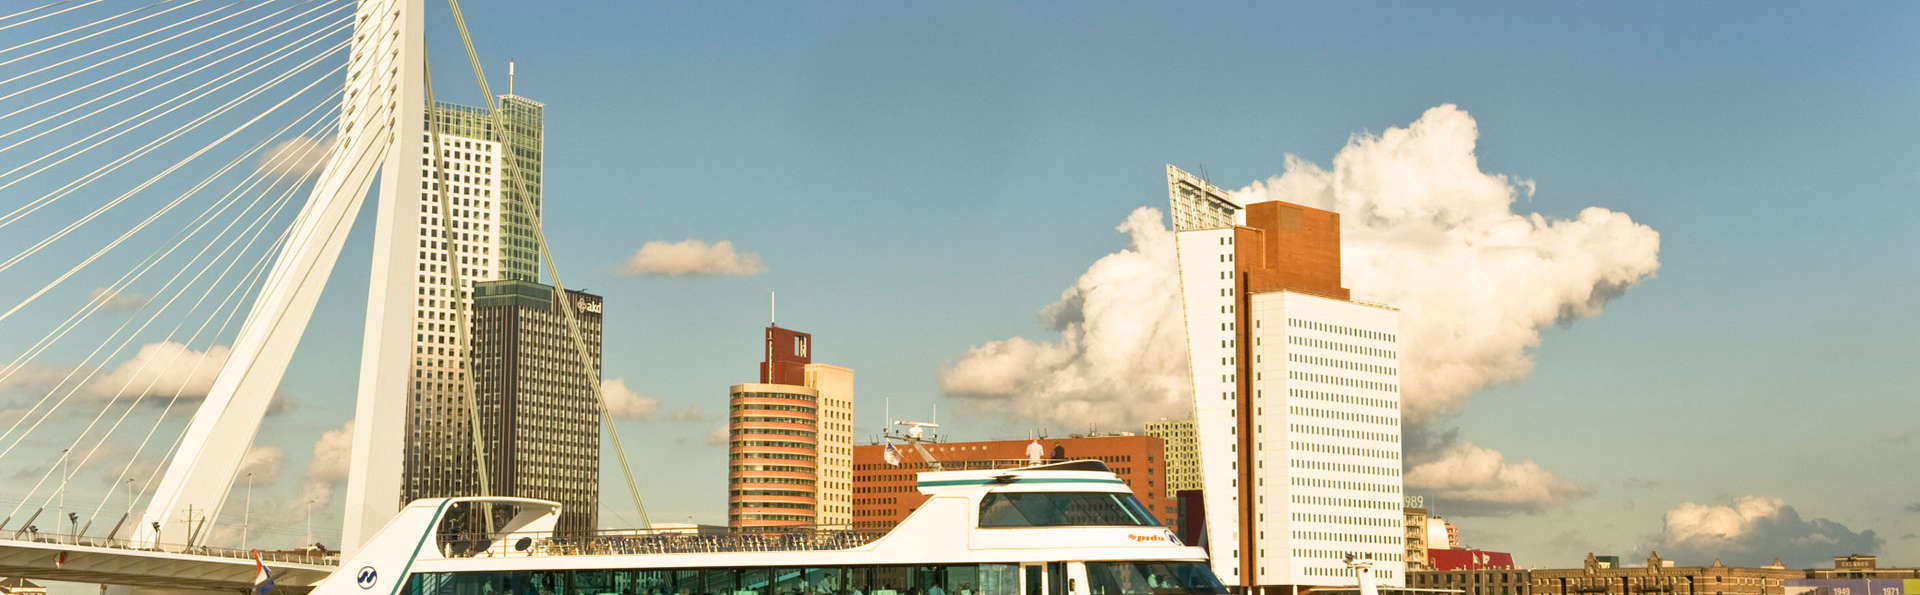 Van der Valk Hotel Rotterdam-Nieuwerkerk - edit_boat.jpg